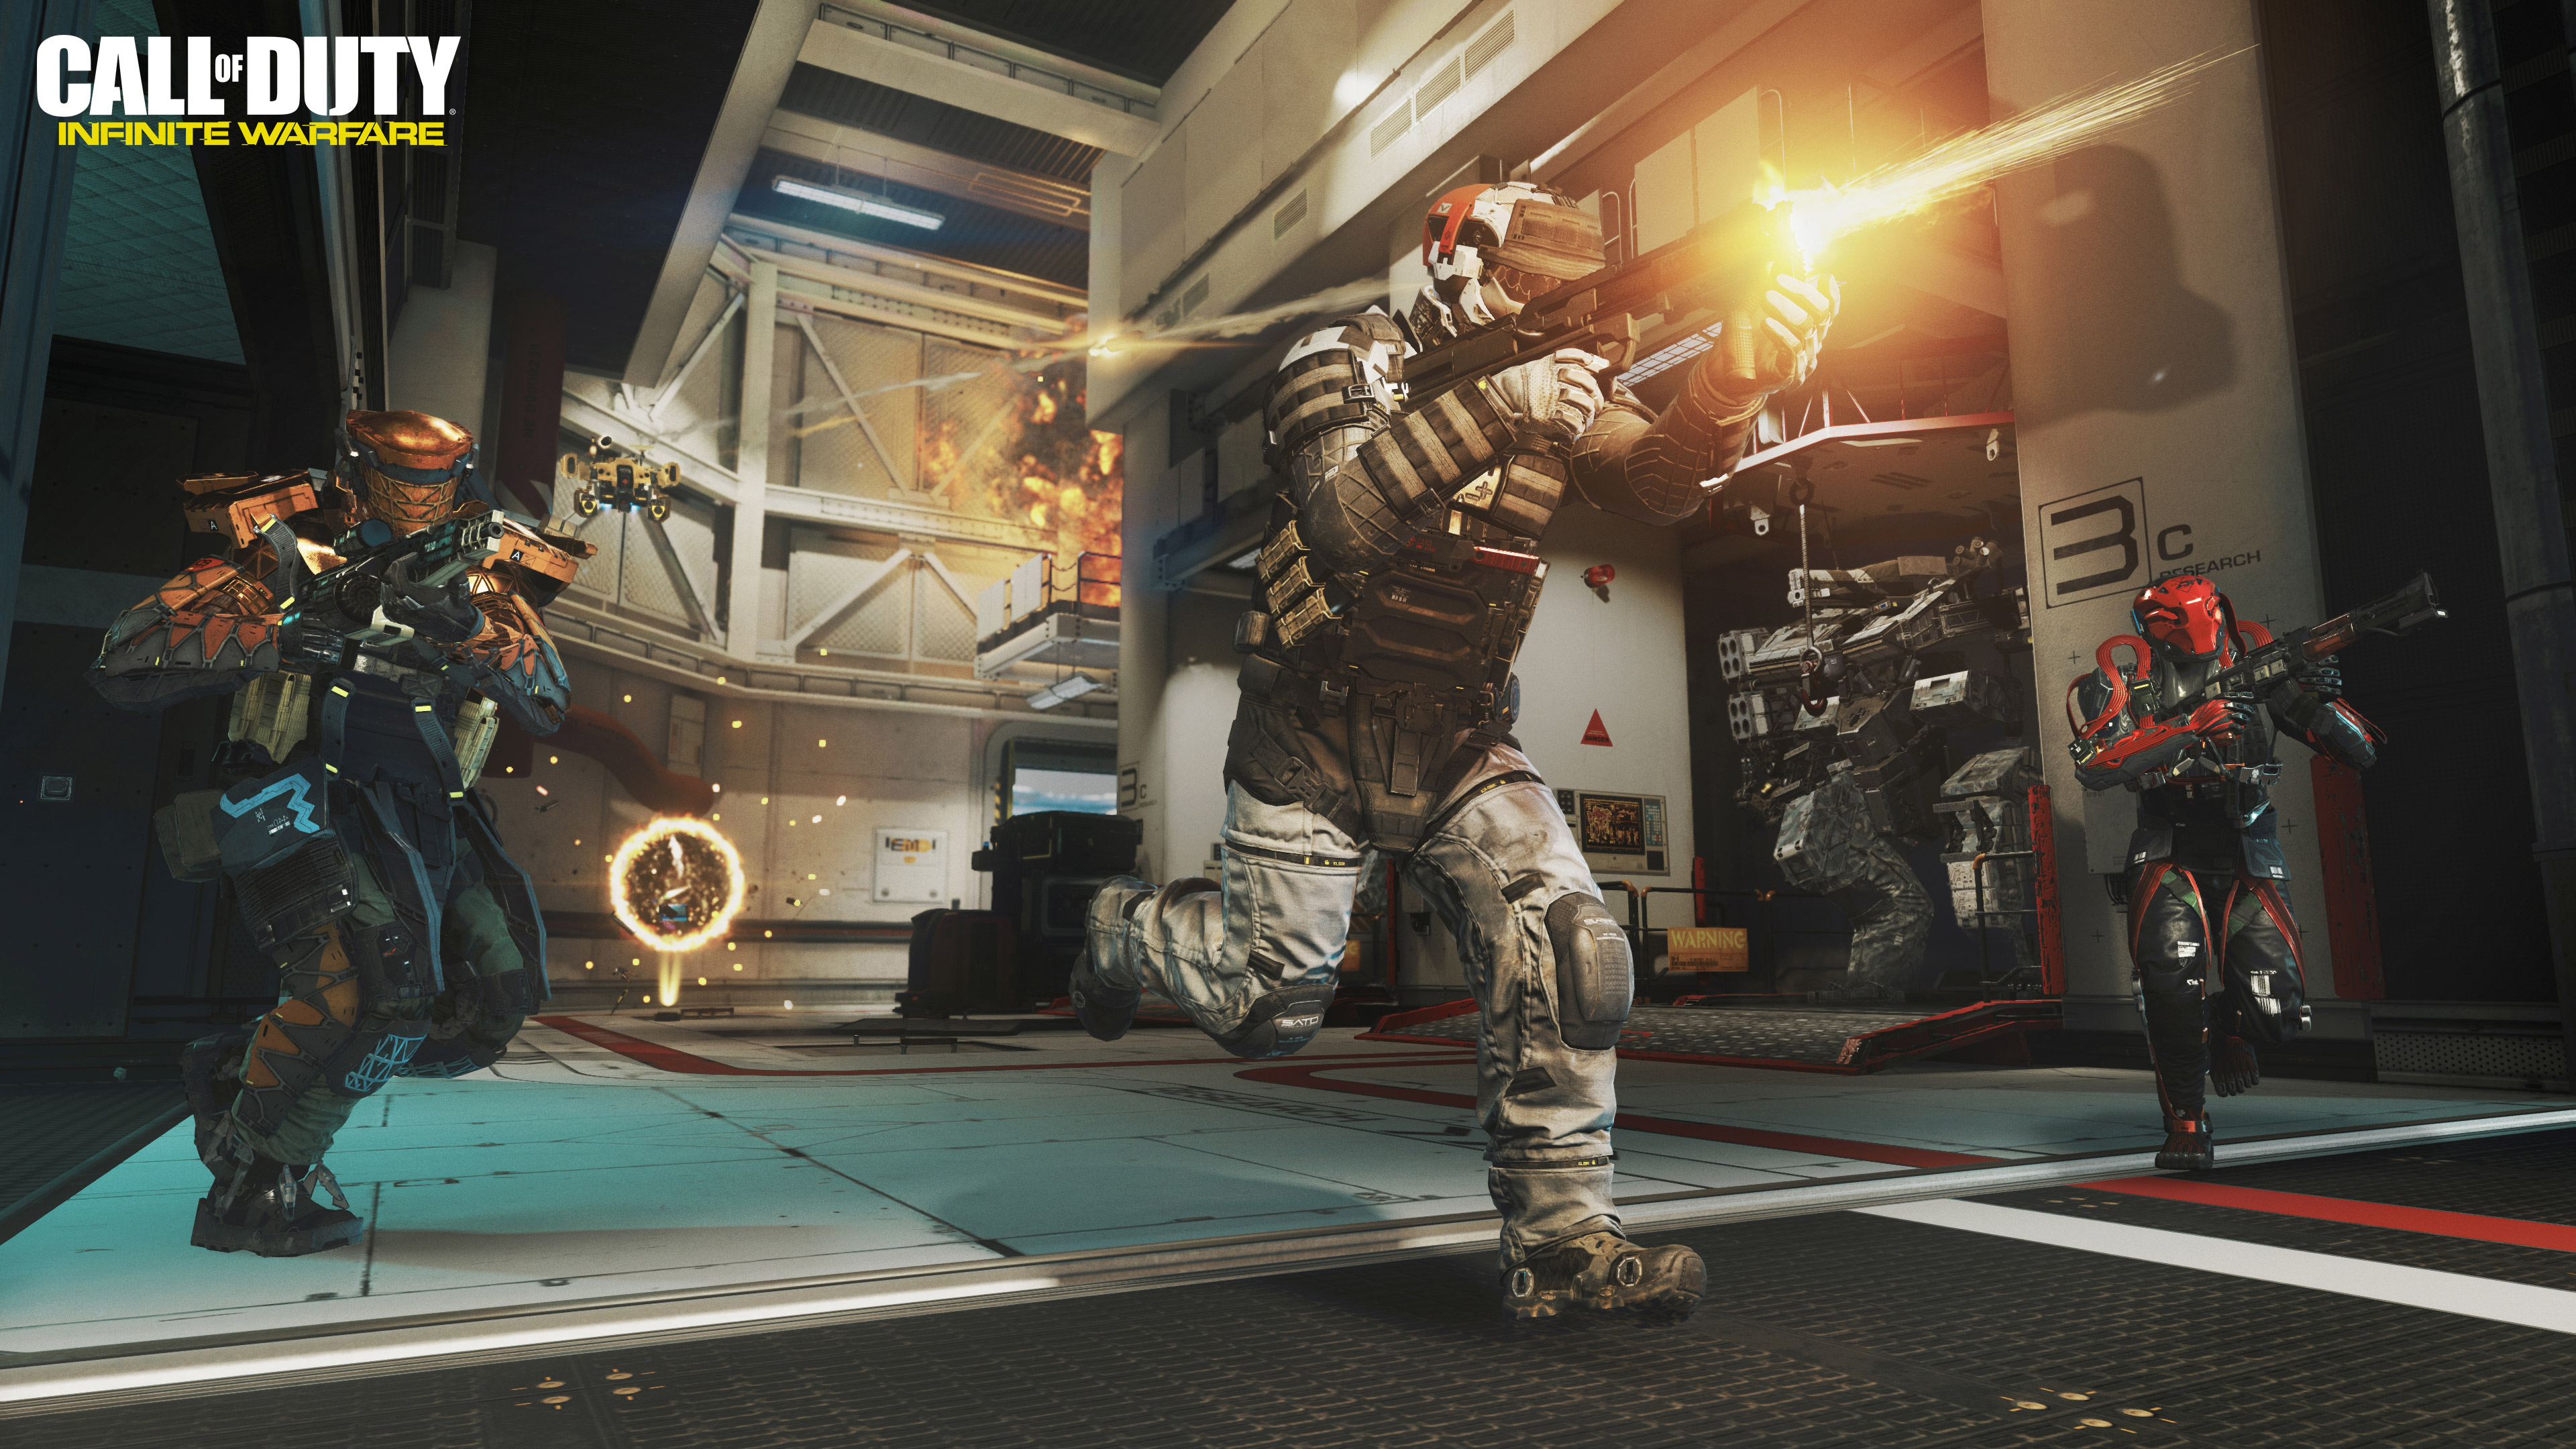 2016 Call Of Duty Infinite Warfare Hd Games 4k Wallpapers